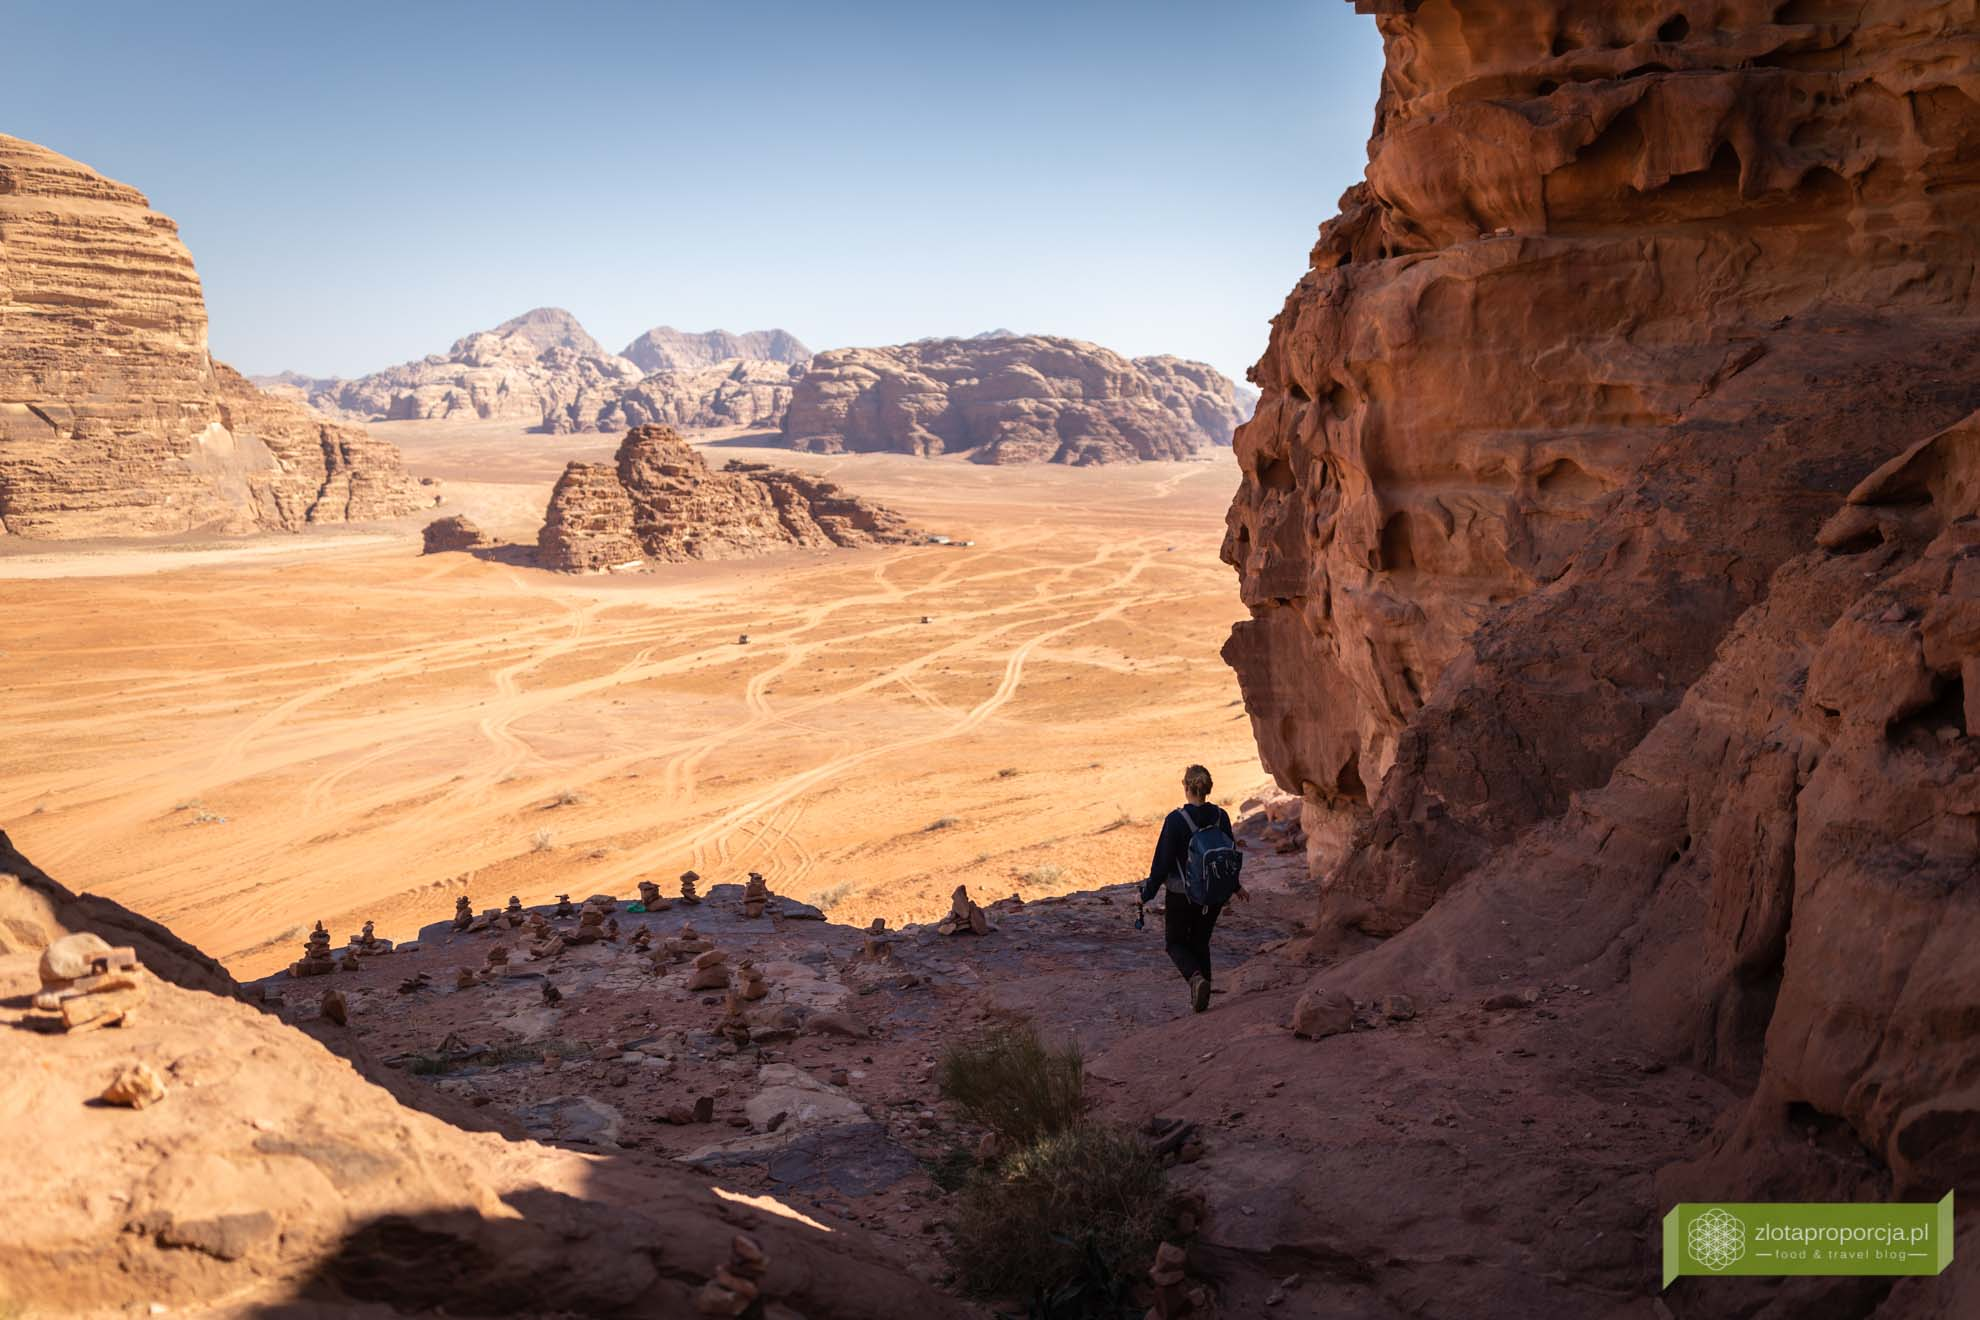 Wadi Rum, pustynia Wadi Rum, Jordania, pustynia Jordania; Wadi rum wycieczka, Wadi Rum zwiedzanie, Jordania atrakcje; Dom Lawrence'a;